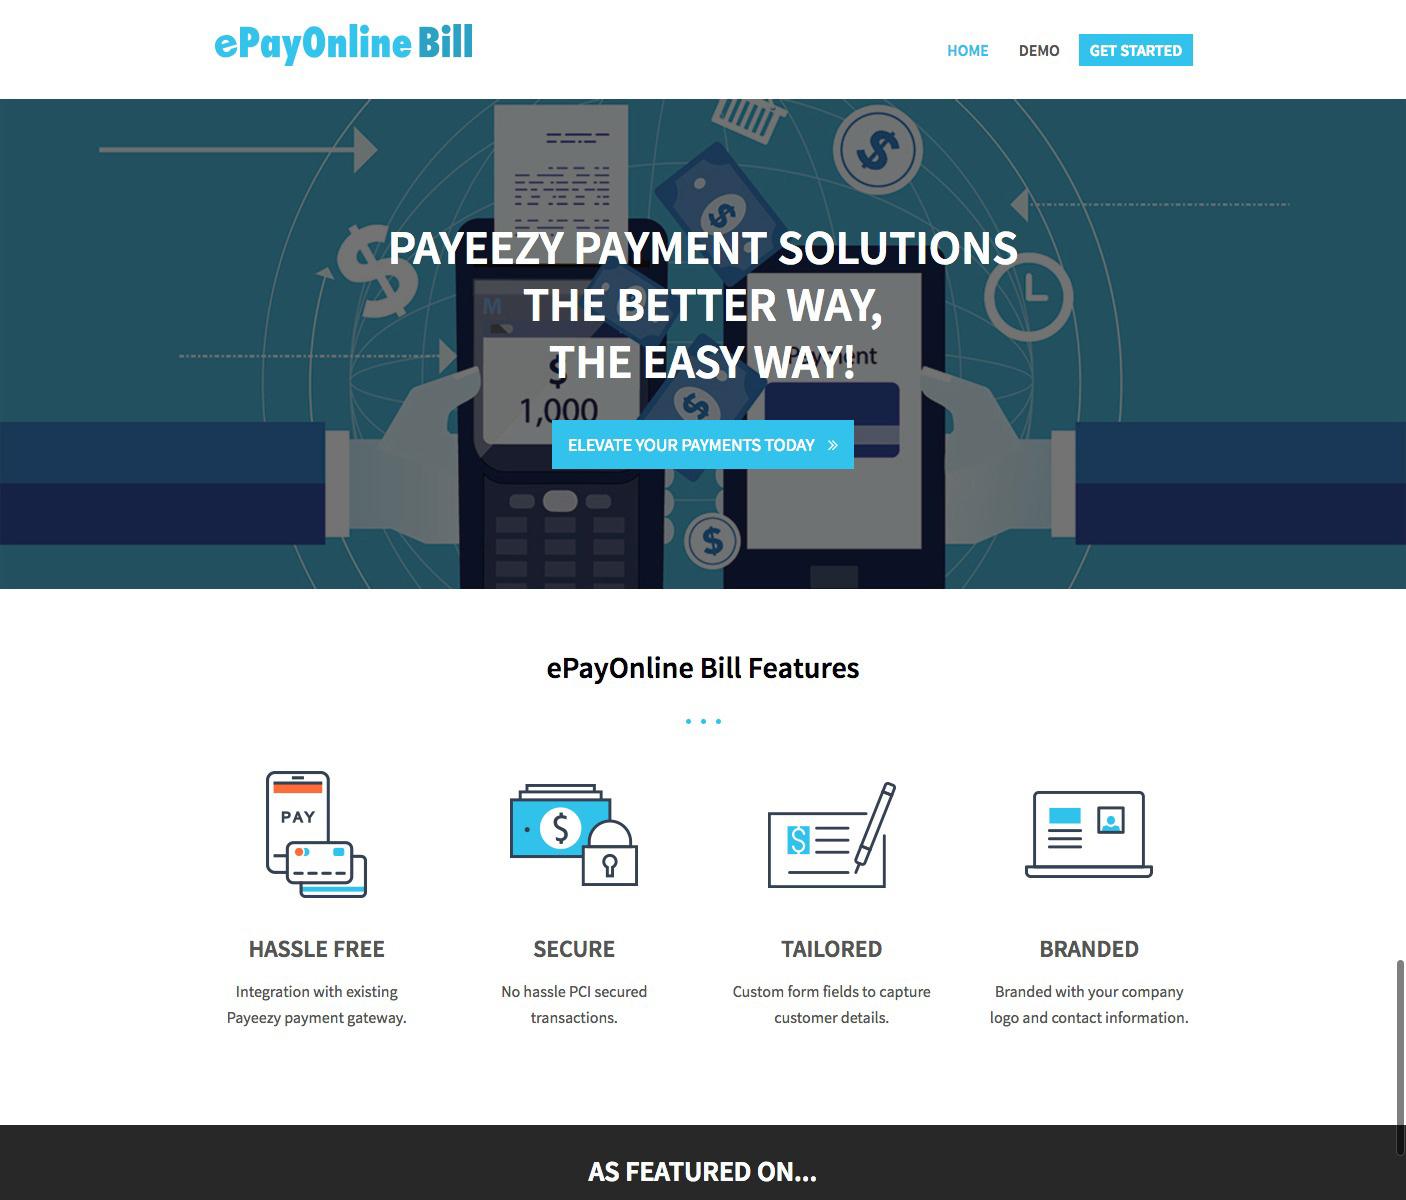 ePayOnline Bill